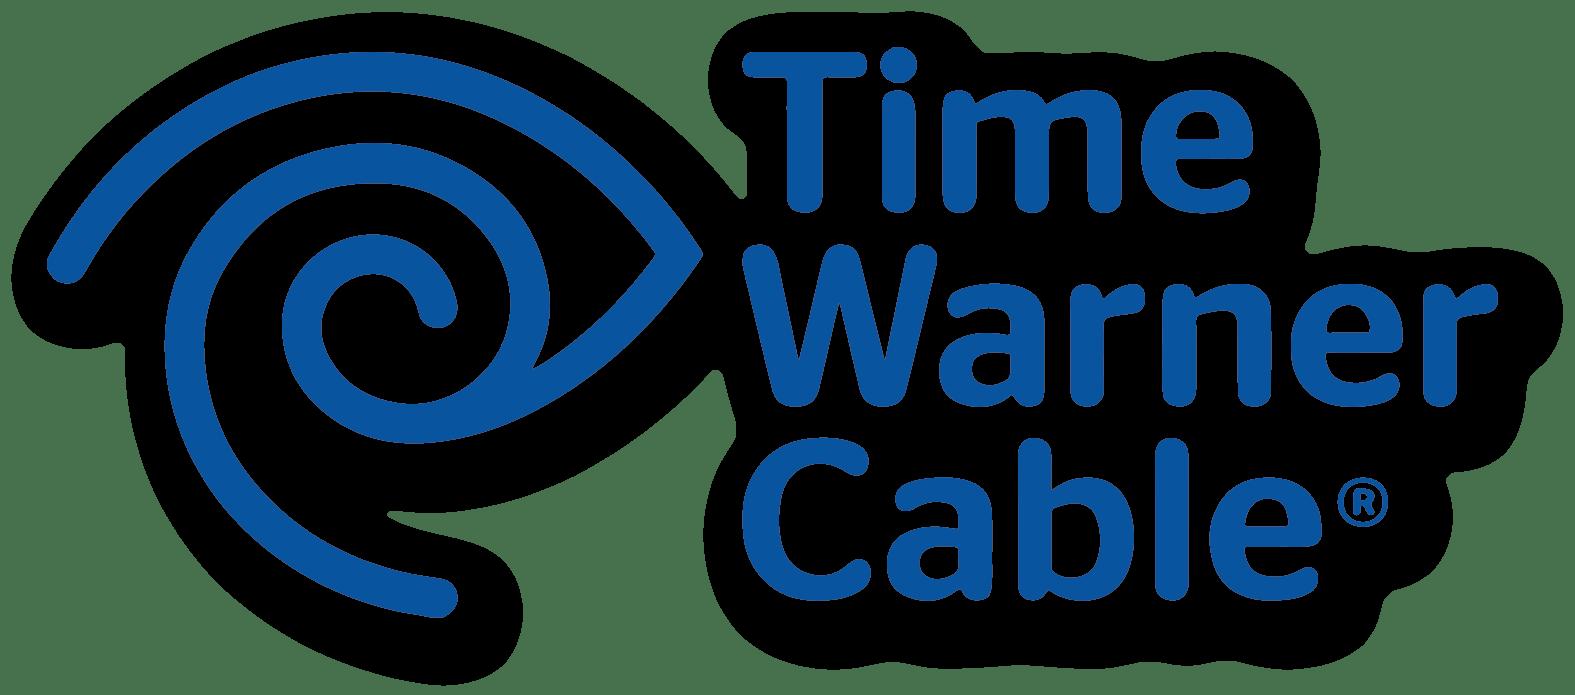 Time Warner Cable Intelligent Phone Number 1800 637 6126